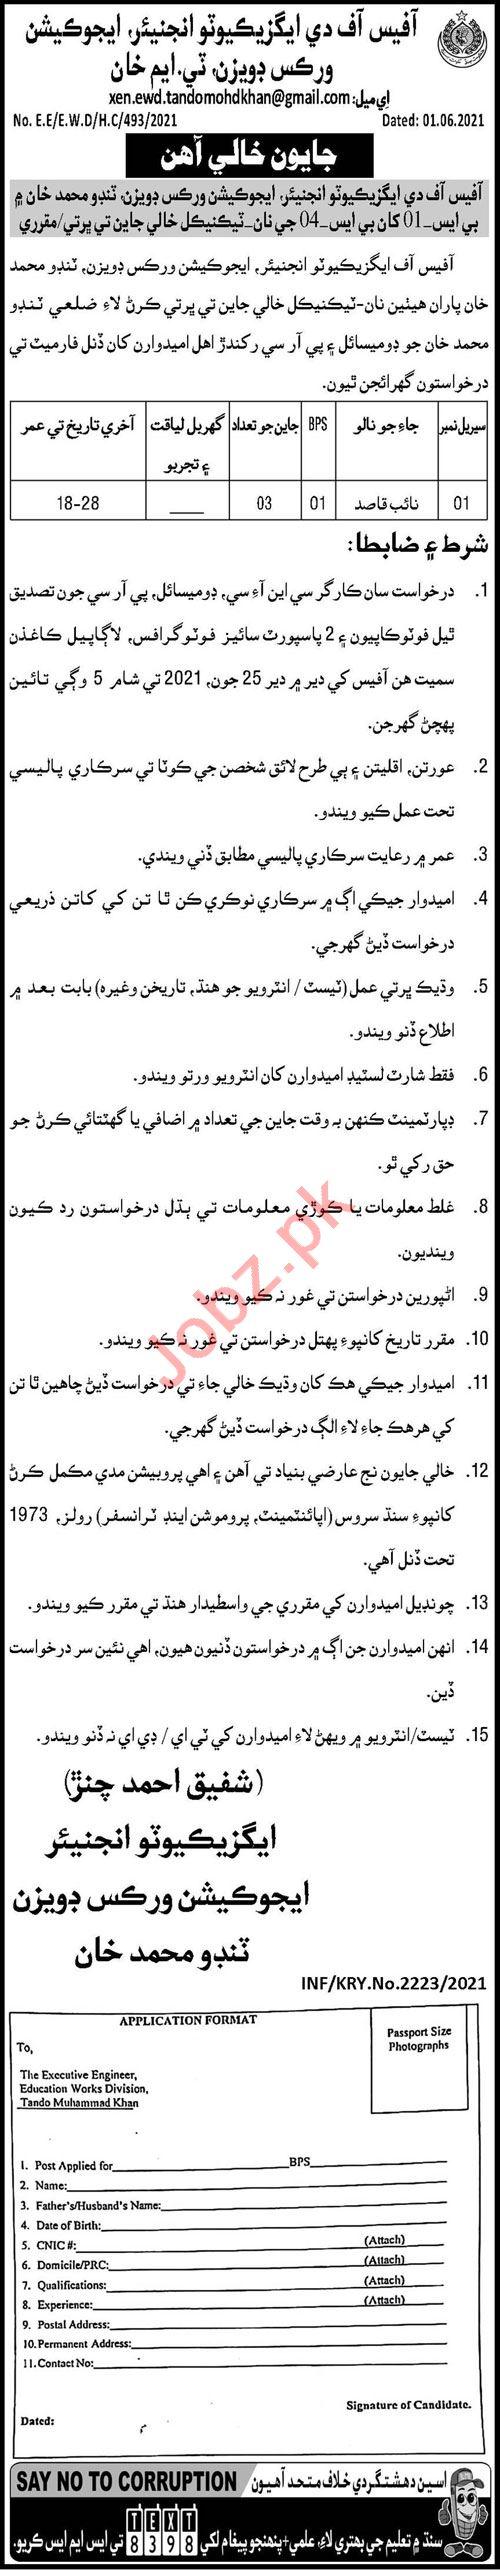 Educations Works Division Tando Muhammad Khan Jobs 2021